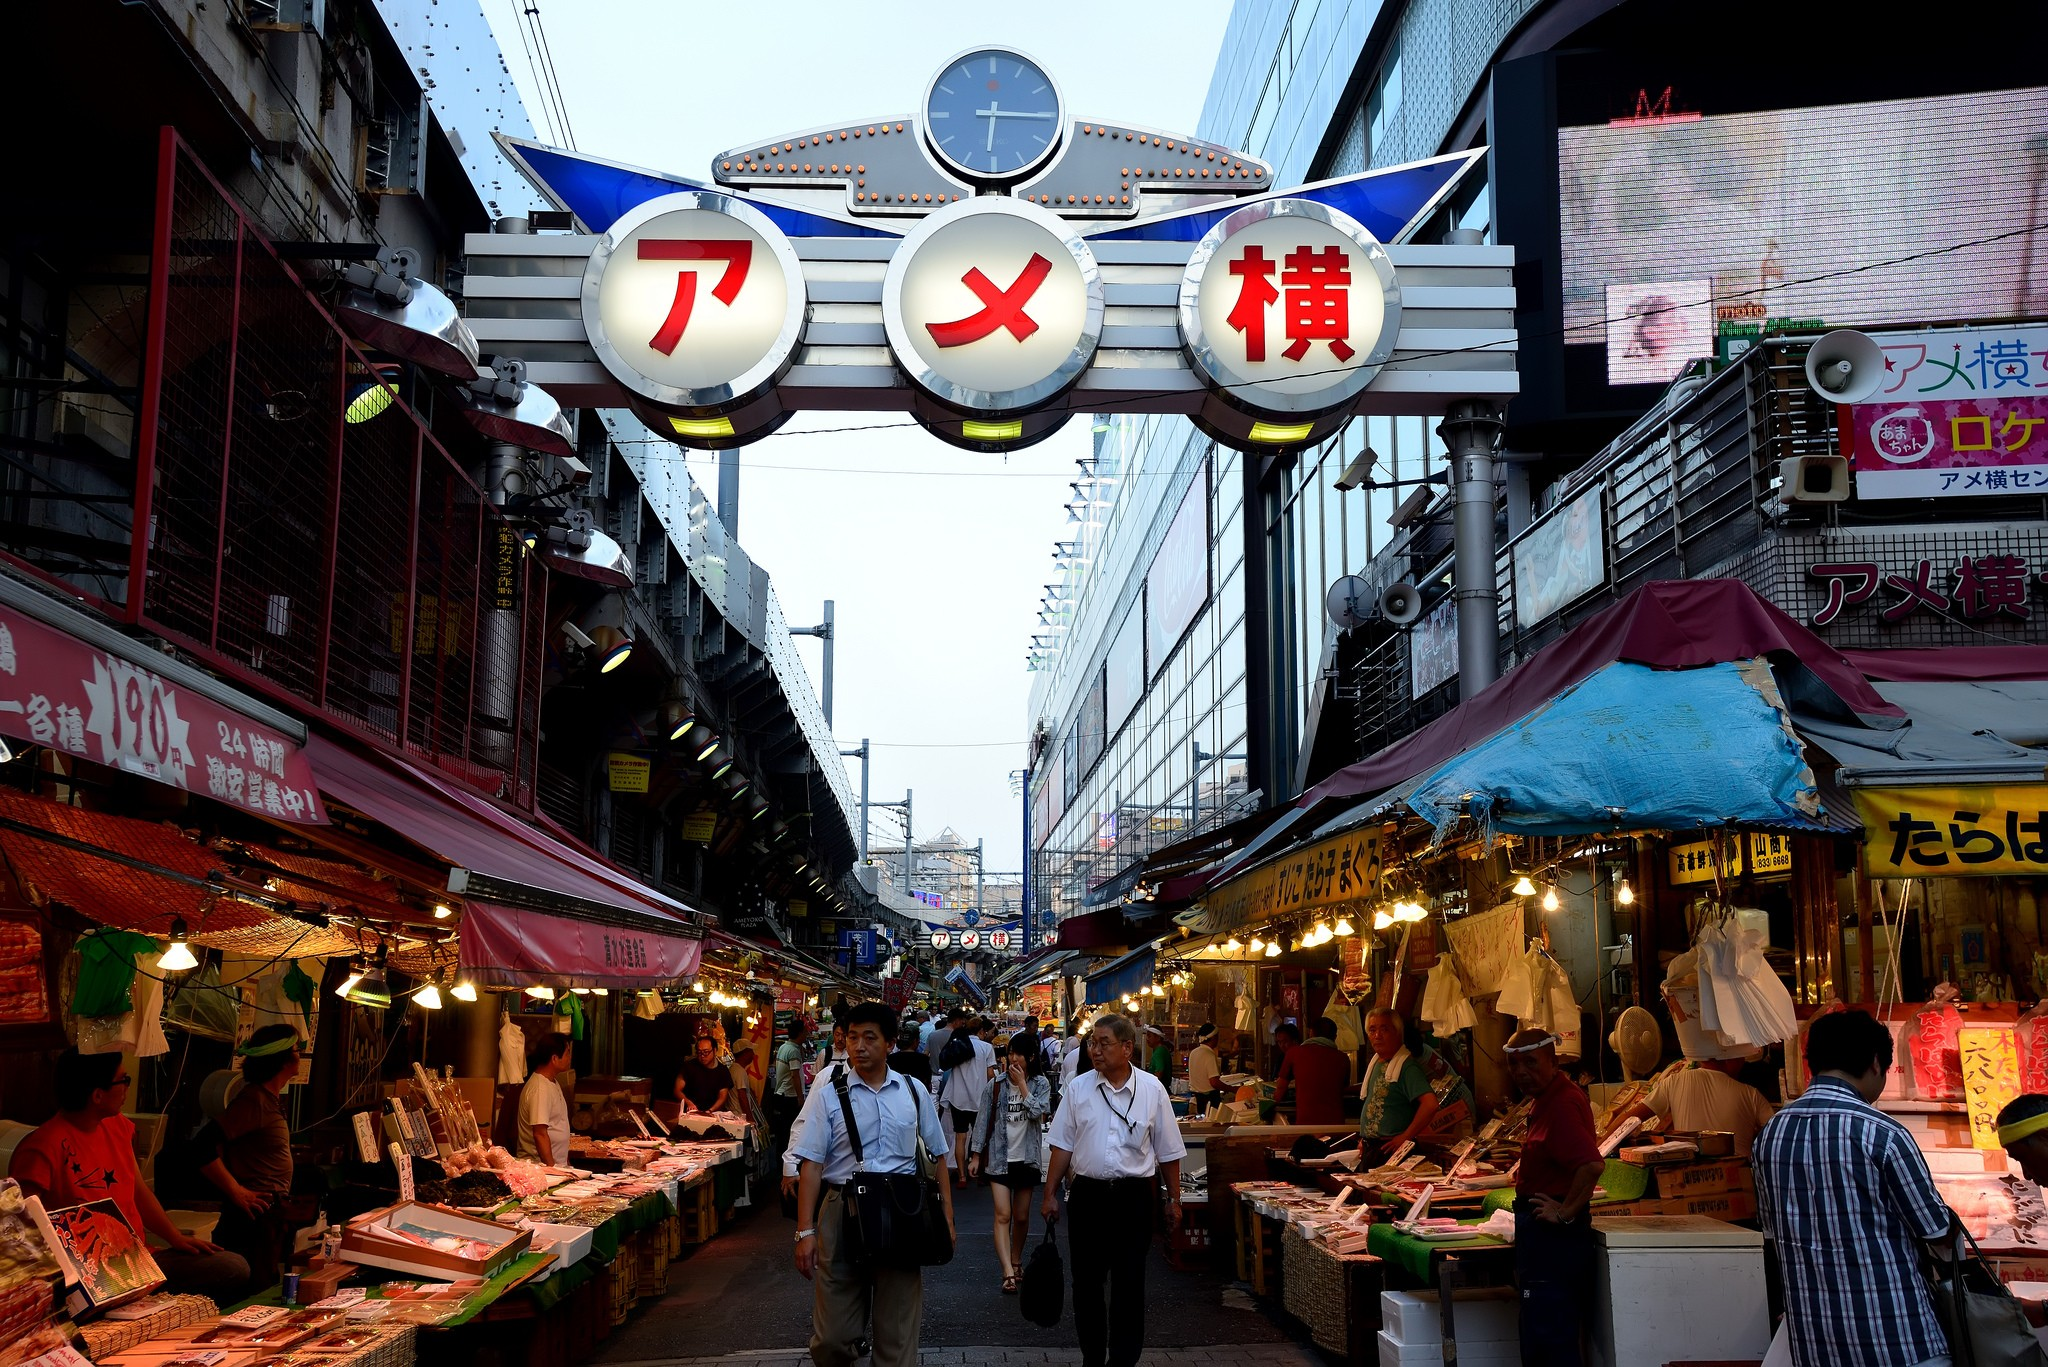 Mercado de Ameyoko, foto de Max Chu.